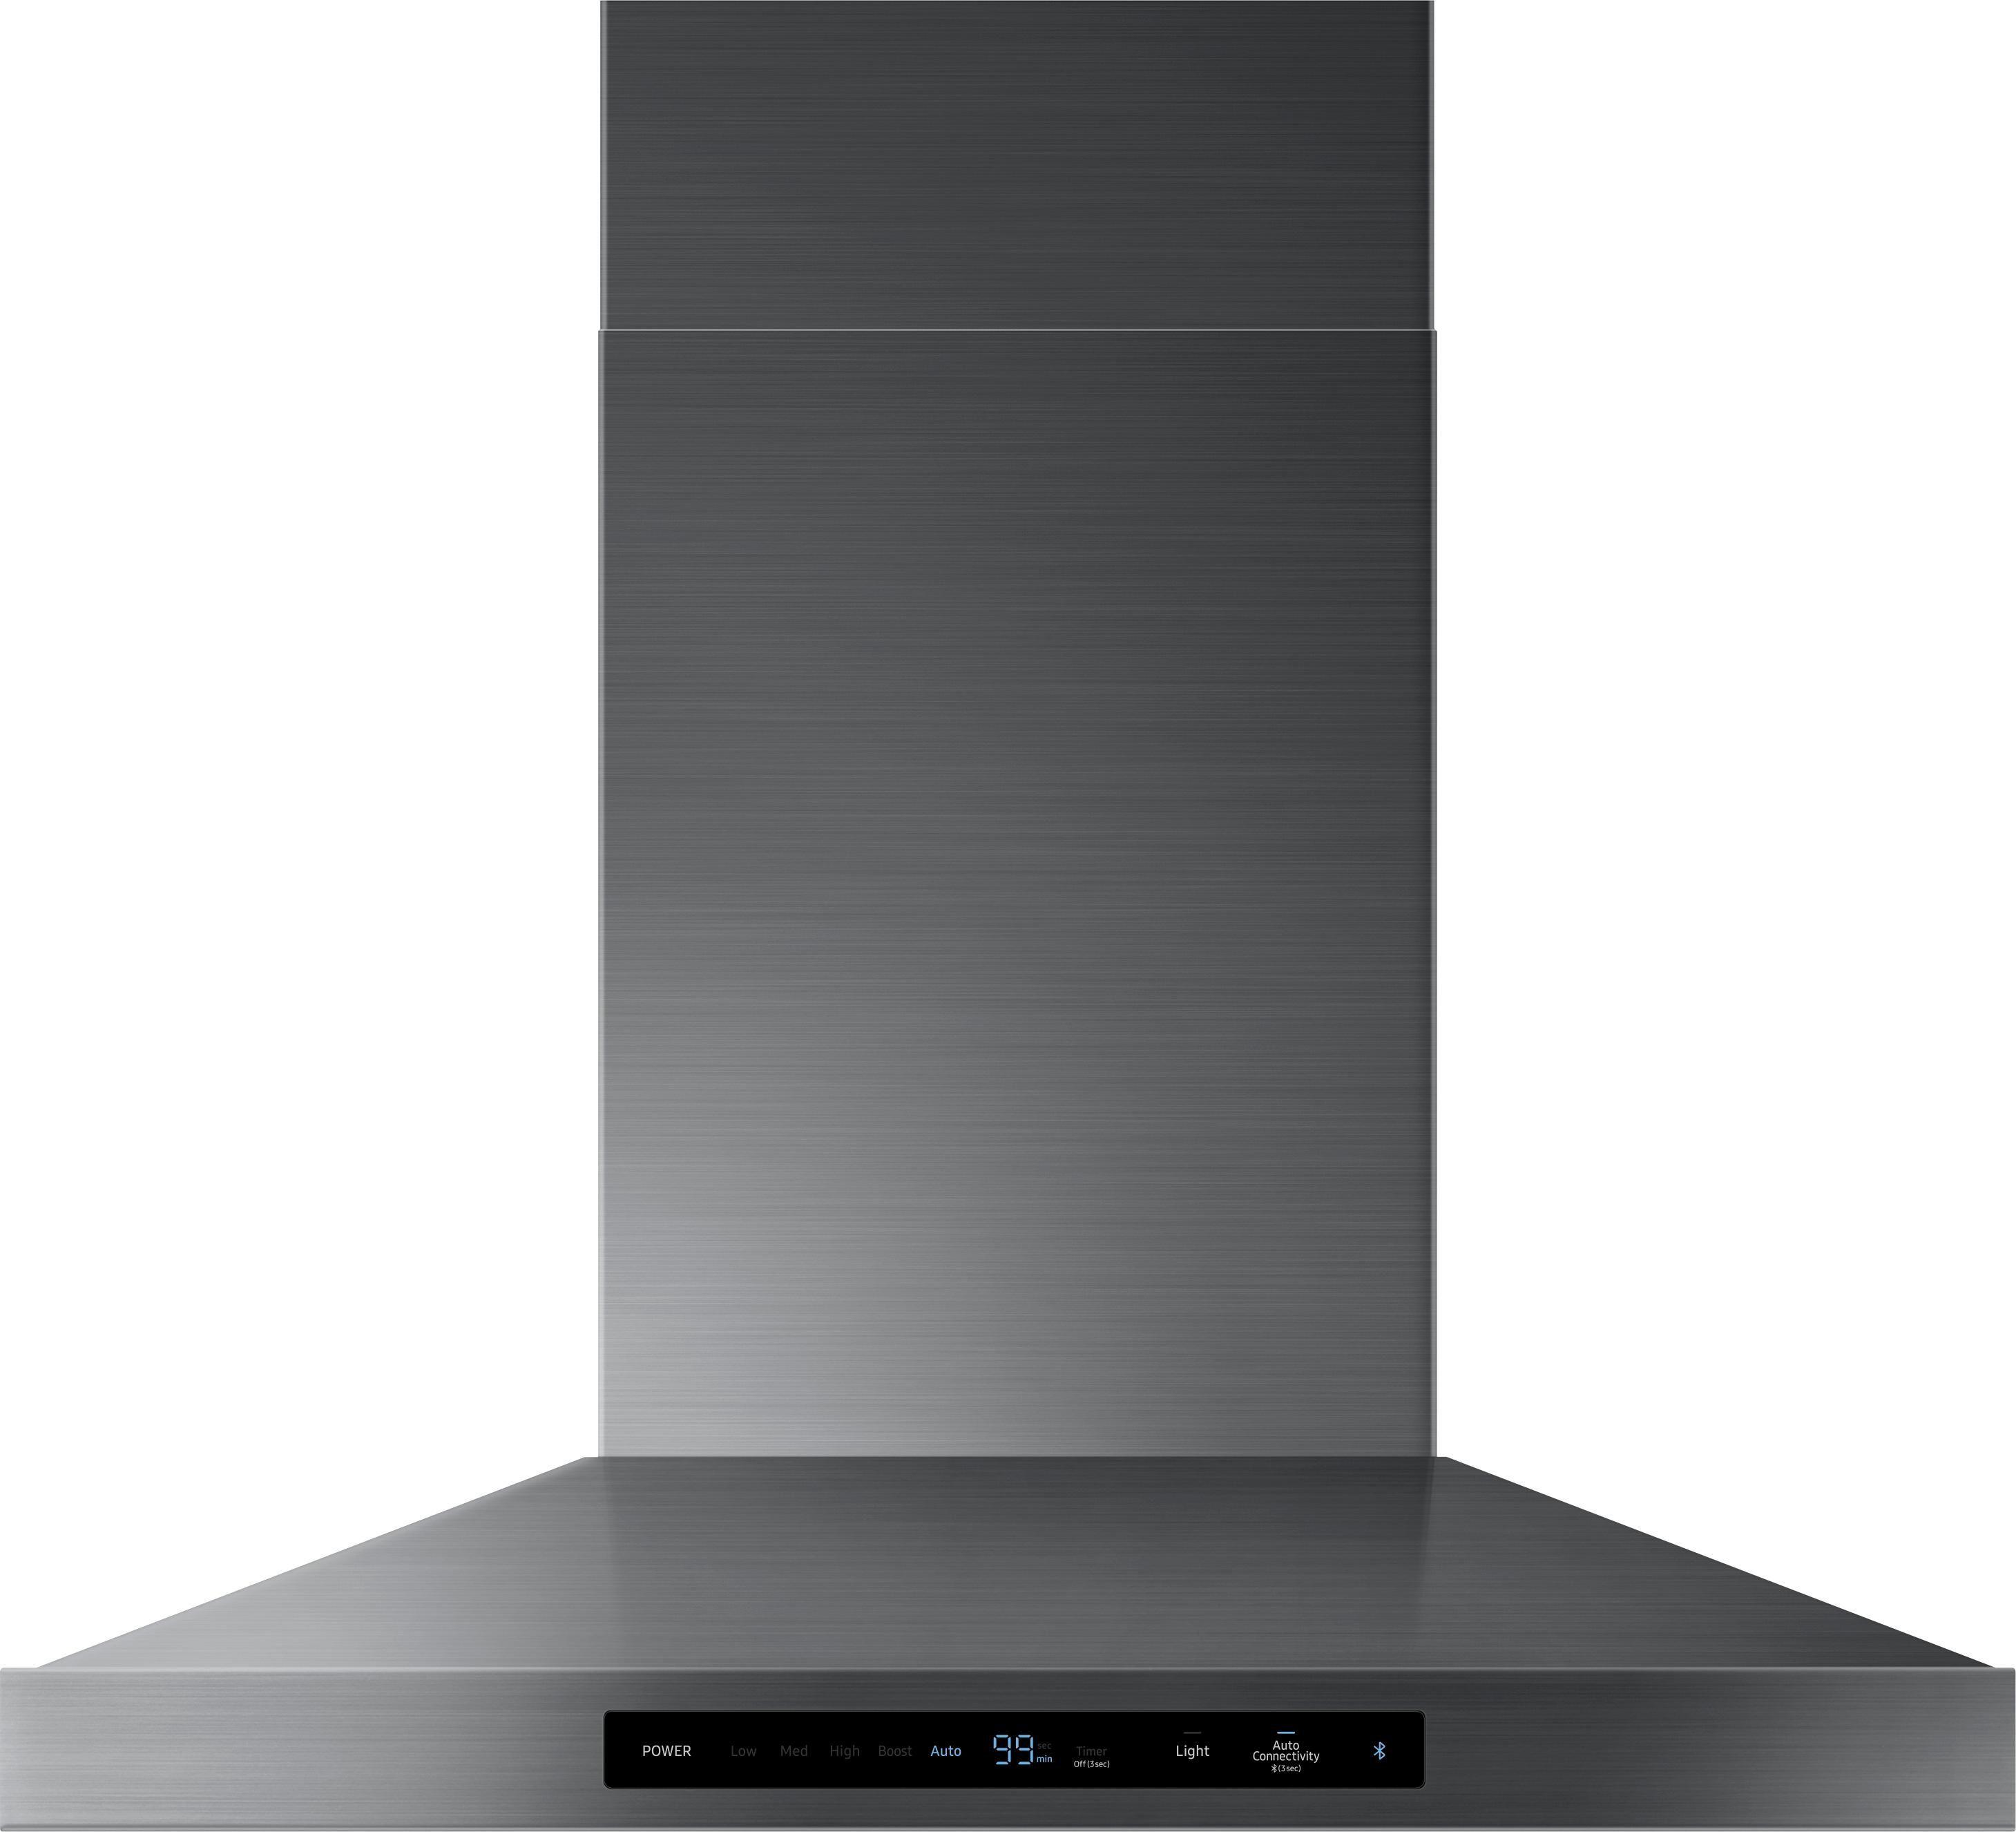 Samsung 30 In Convertible Fingerprint Resistant Black Stainless Steel Wall Mounted Range Hood Lowes Com Steel Wall Black Stainless Steel Kitchen Stainless Steel Range Hood